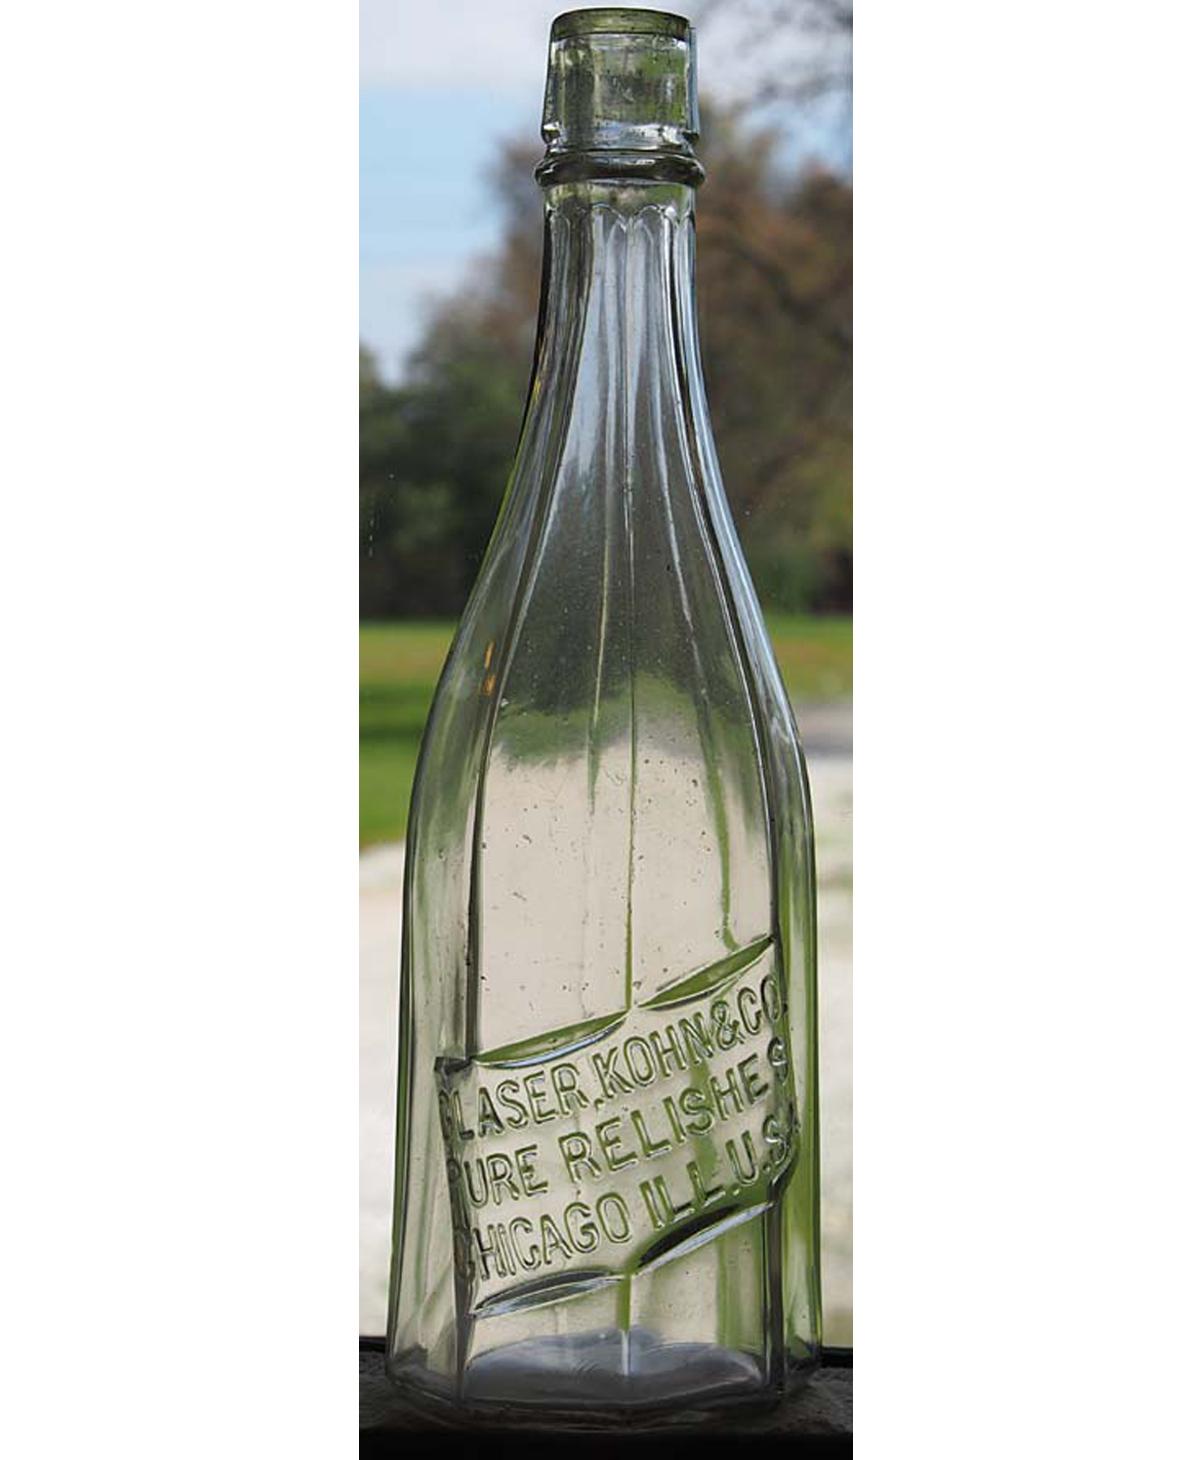 Glaser, Kohn & Co. Pure Relishes